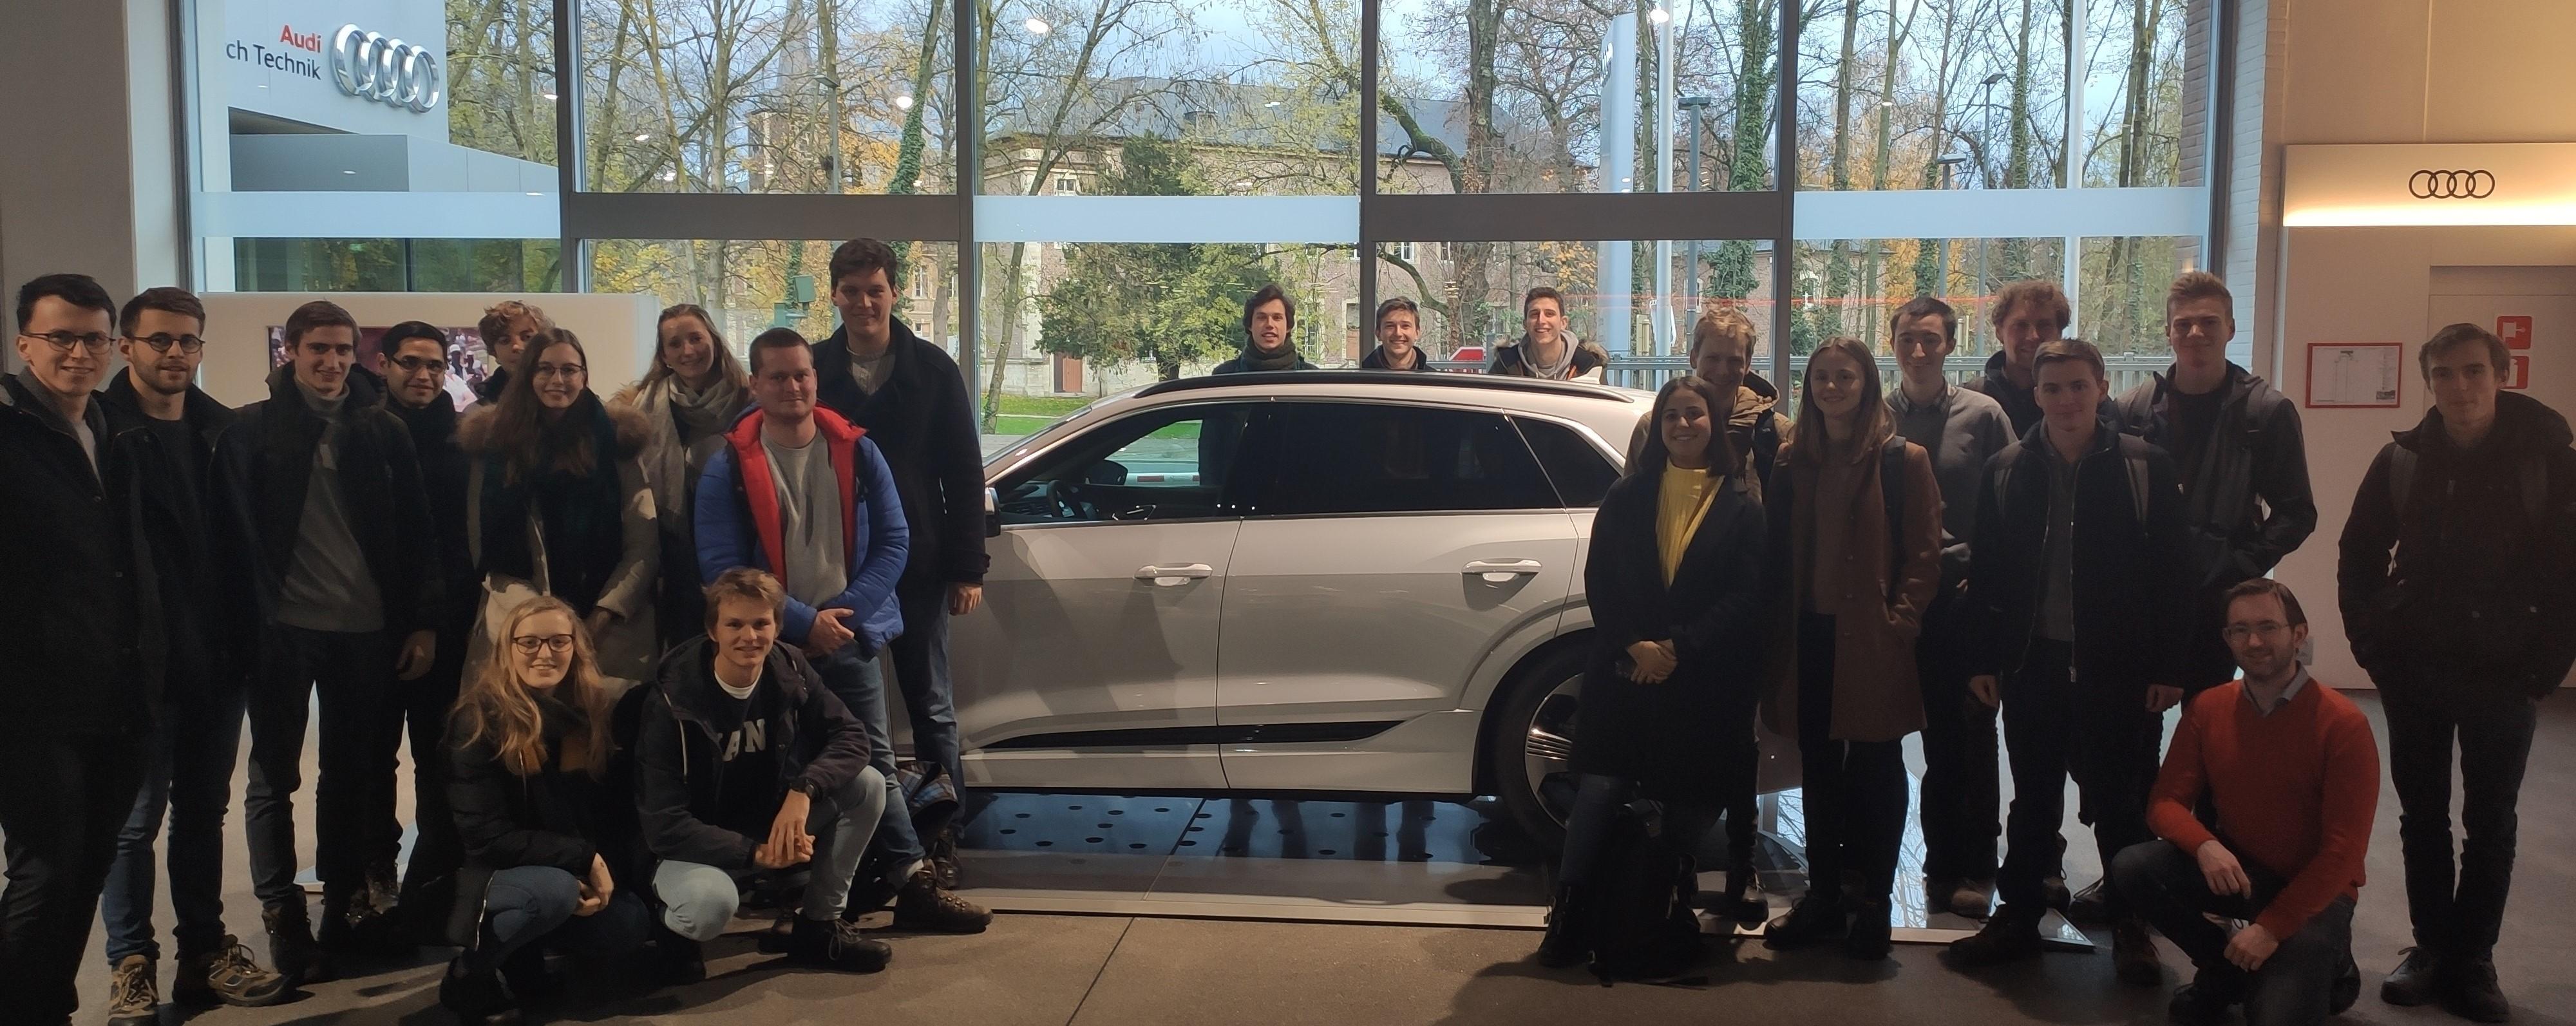 Bezoek Audi 2019